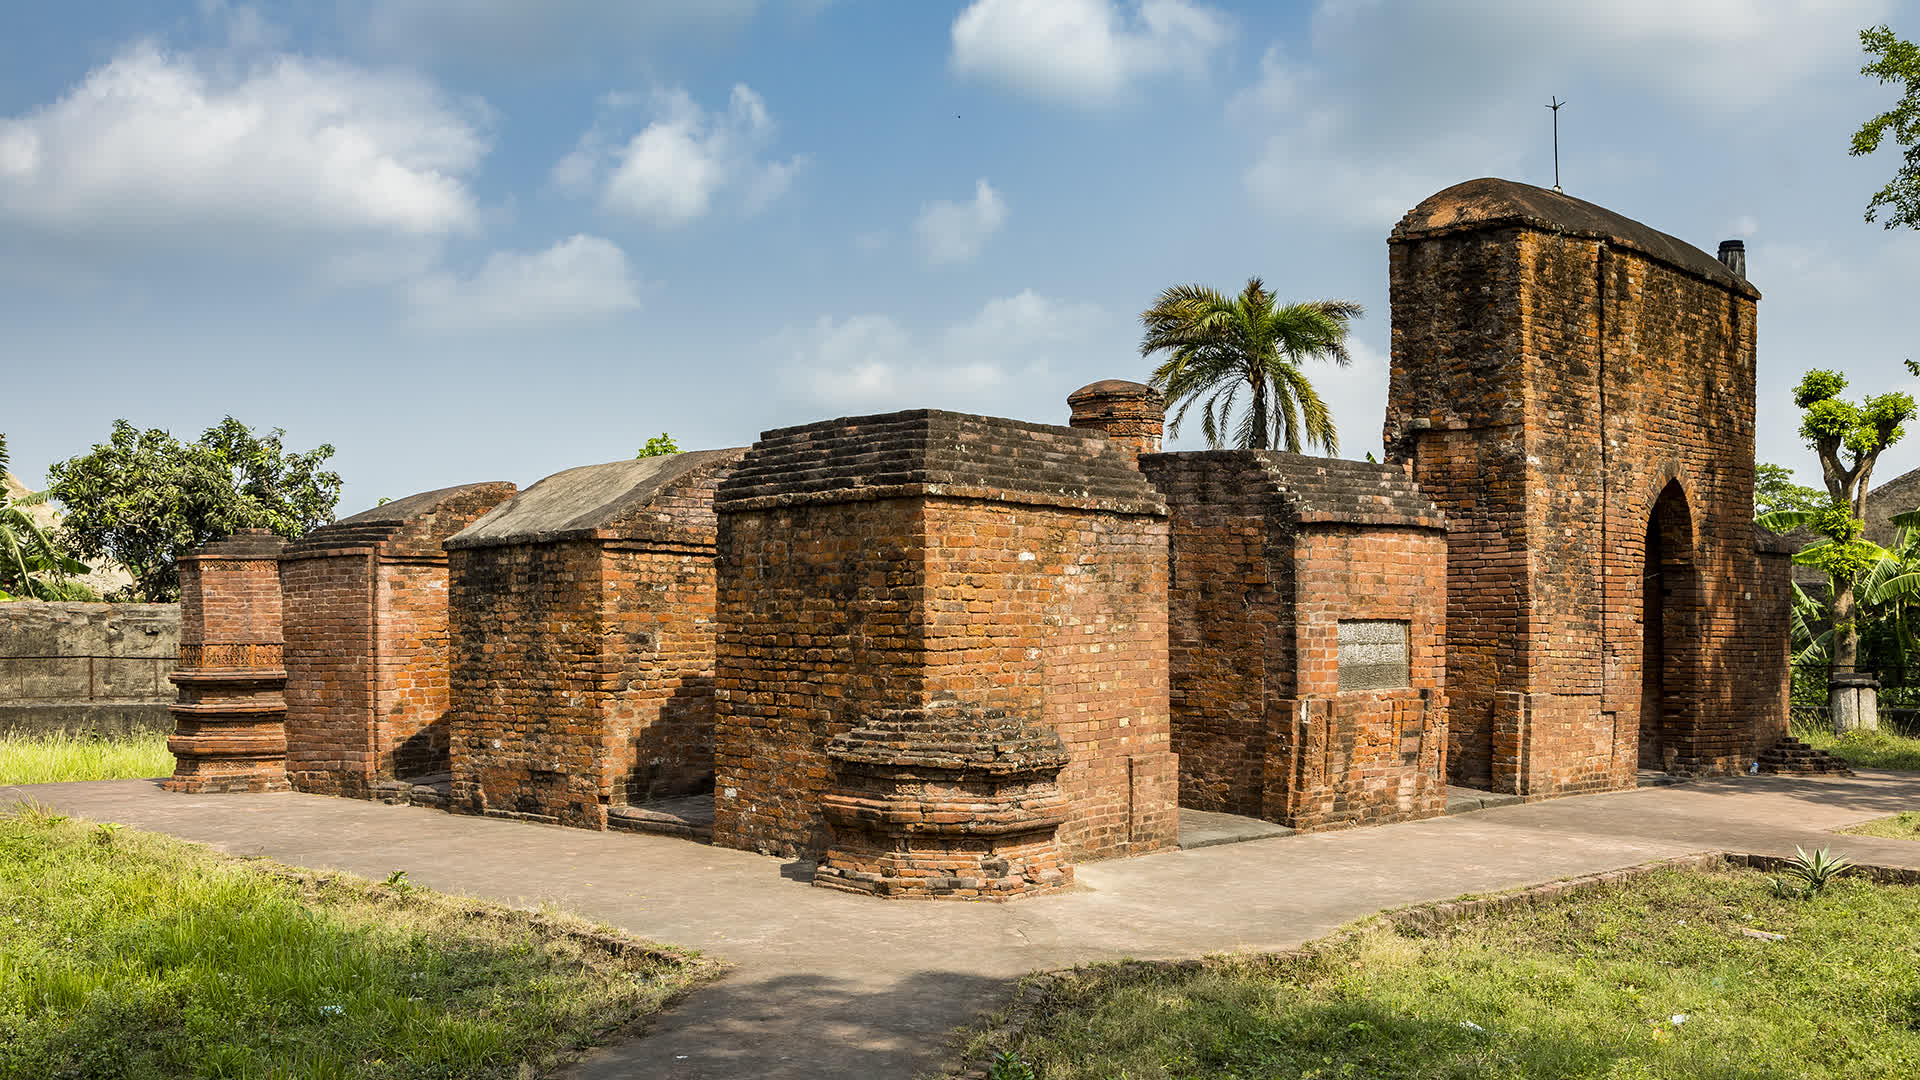 Saptagram: A Port that Ran Aground